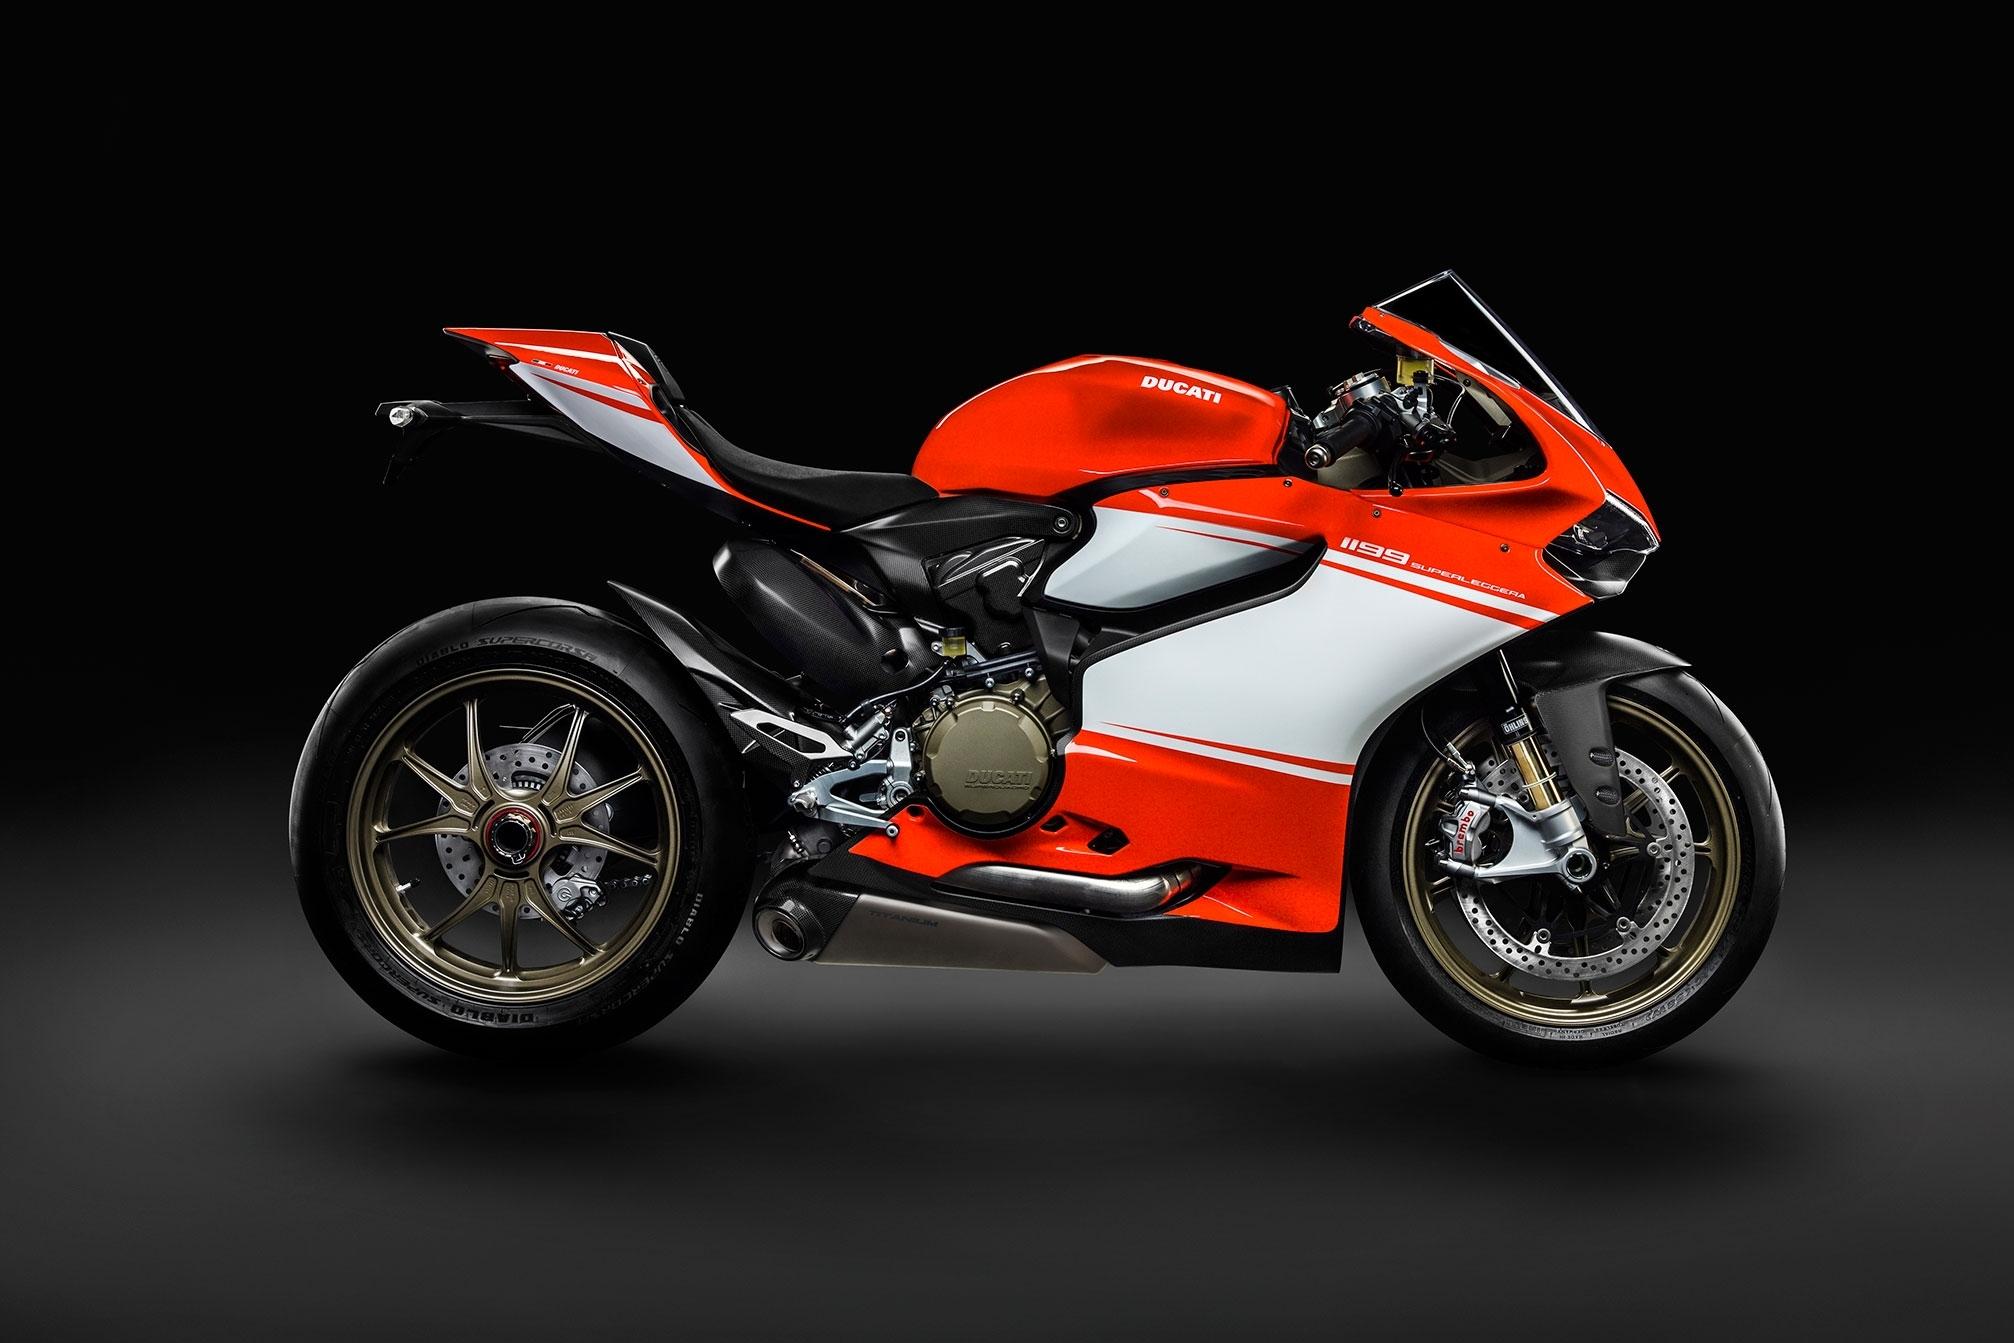 ducati superbike image